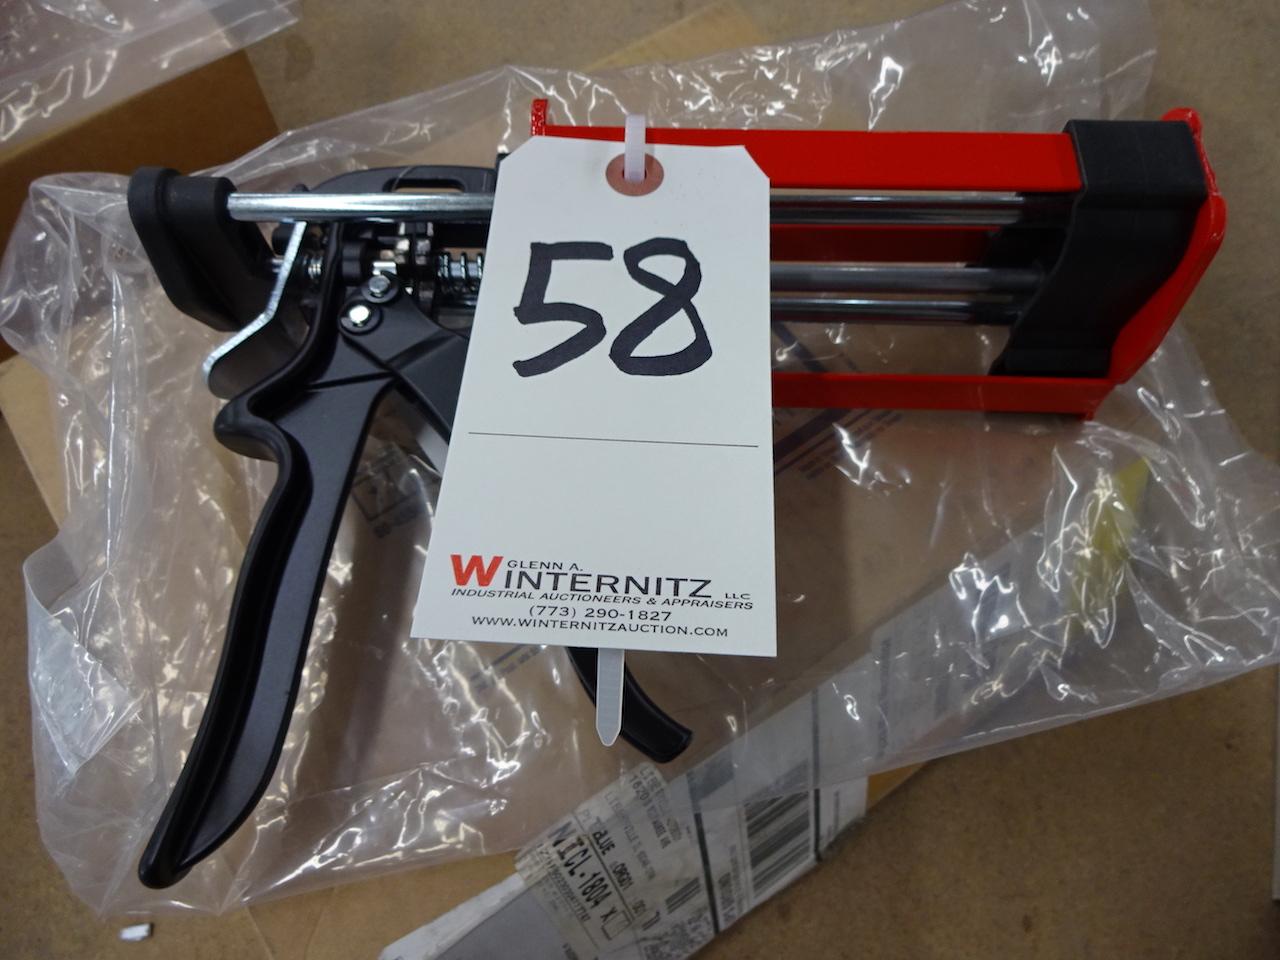 Lot 58 - 3M MANUAL 200ML CARTRIDGE APPLICATOR GUN